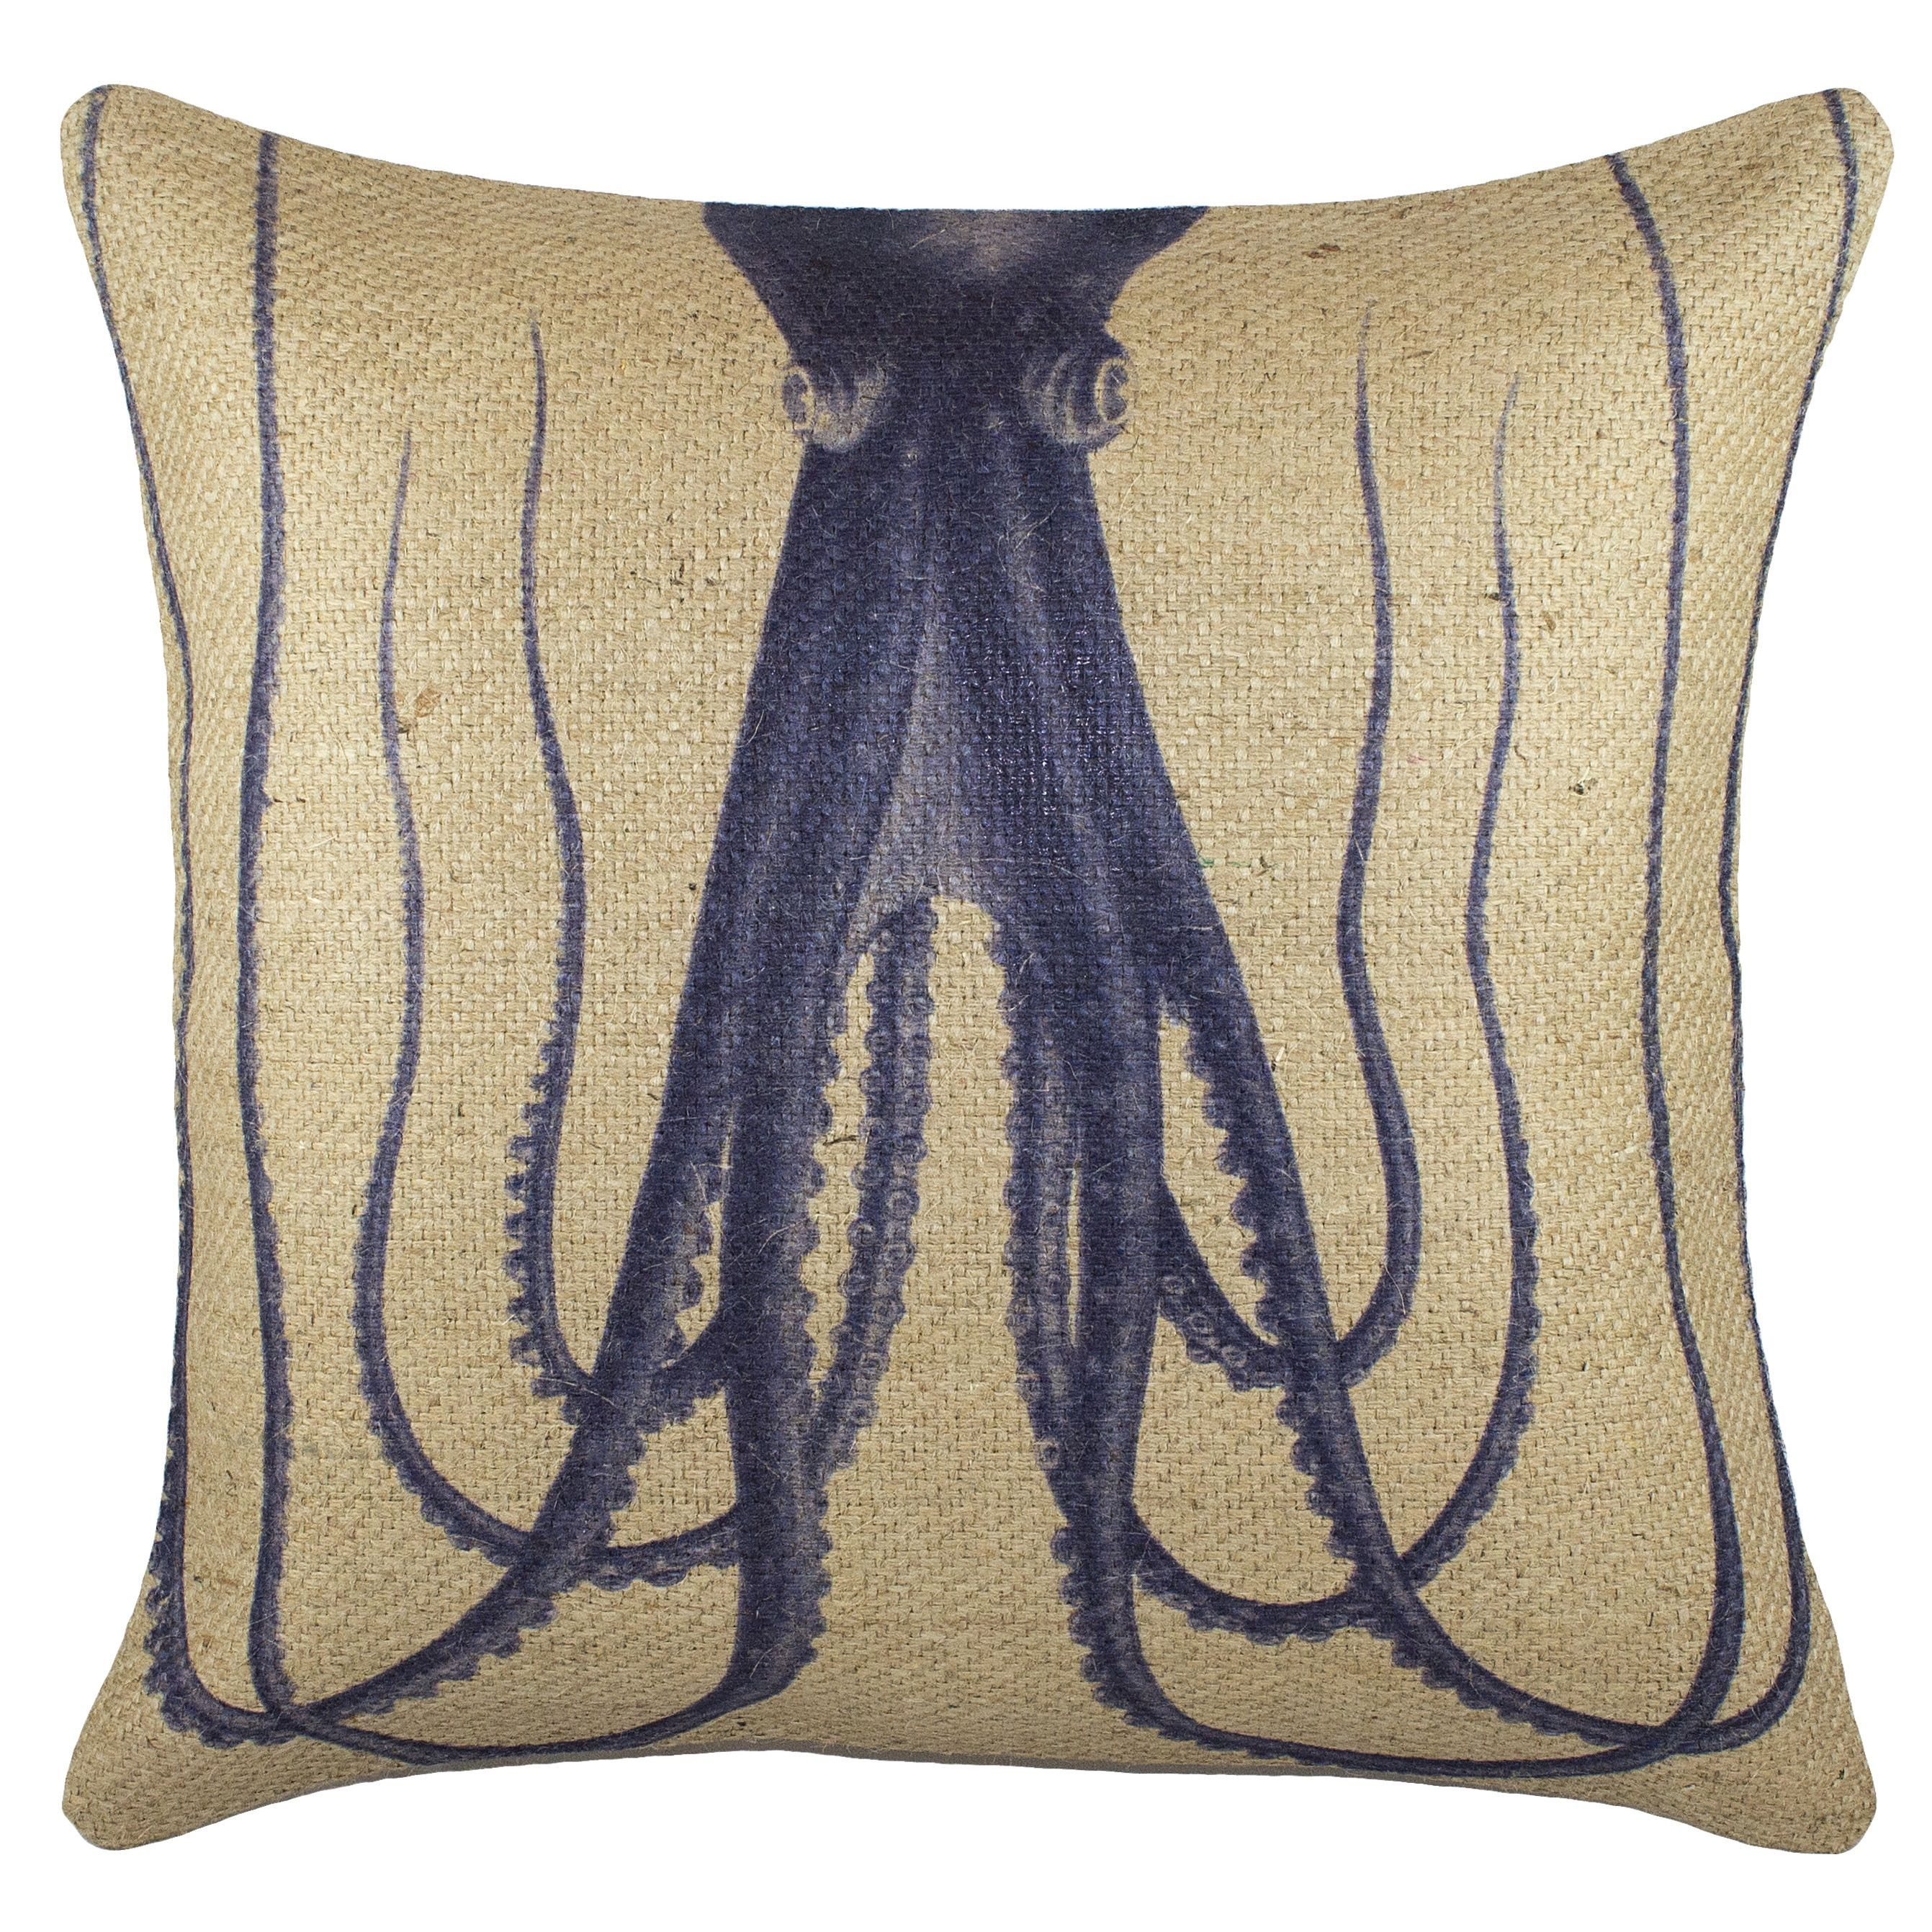 aquasealpro attractive best pinterest pillow encouraging com images pillowtalk burlap of covers photos on